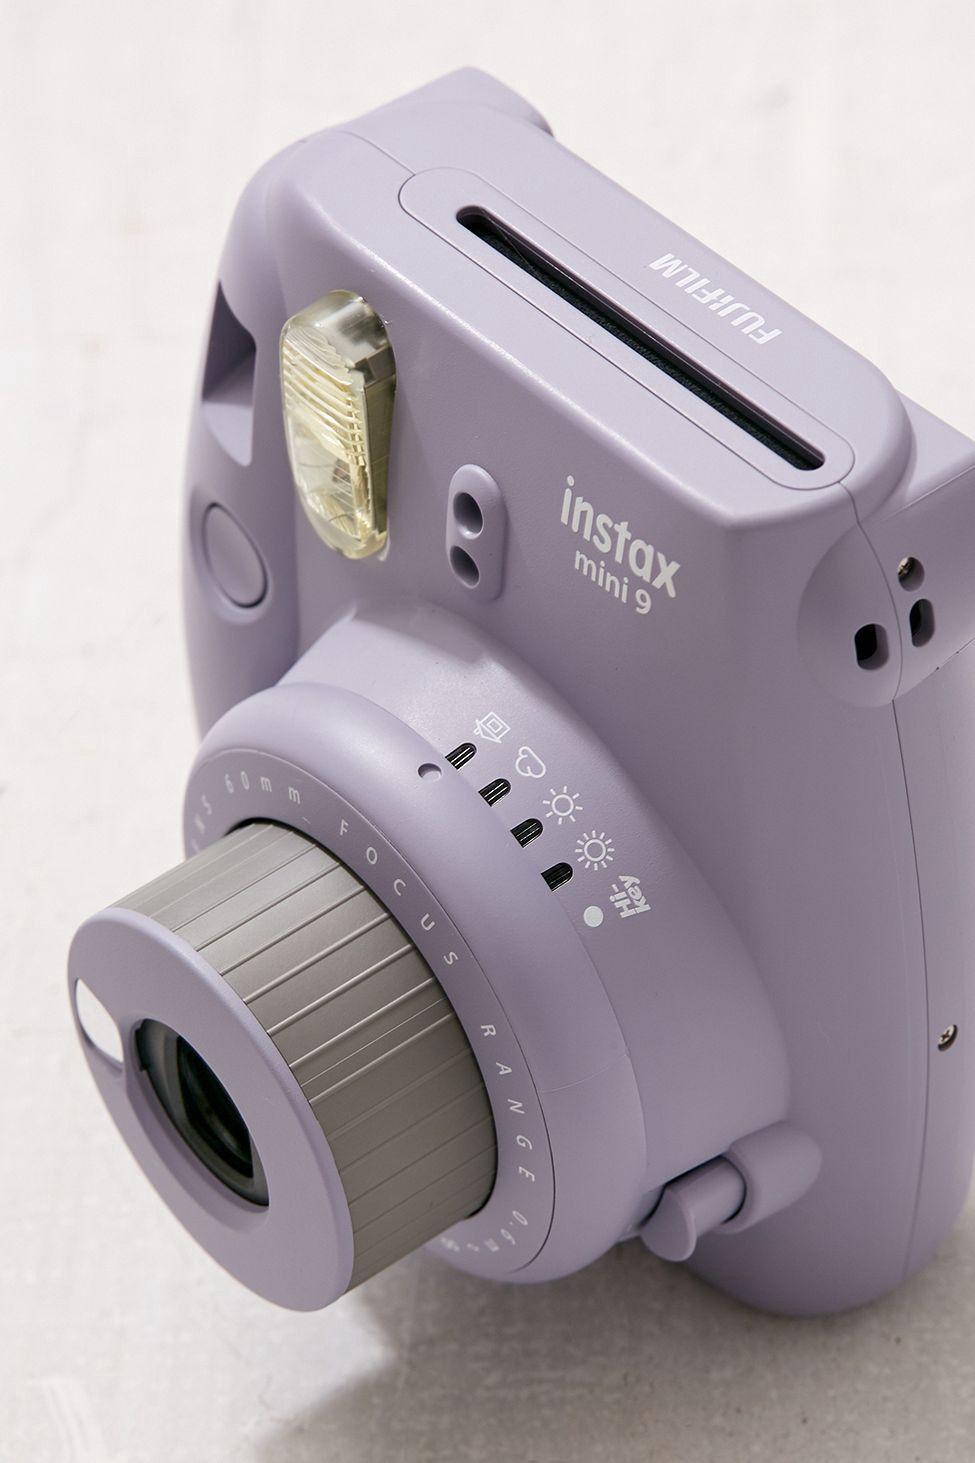 Urban Outfitters Fujifilm X Uo Instax Mini 9 Instant Camera